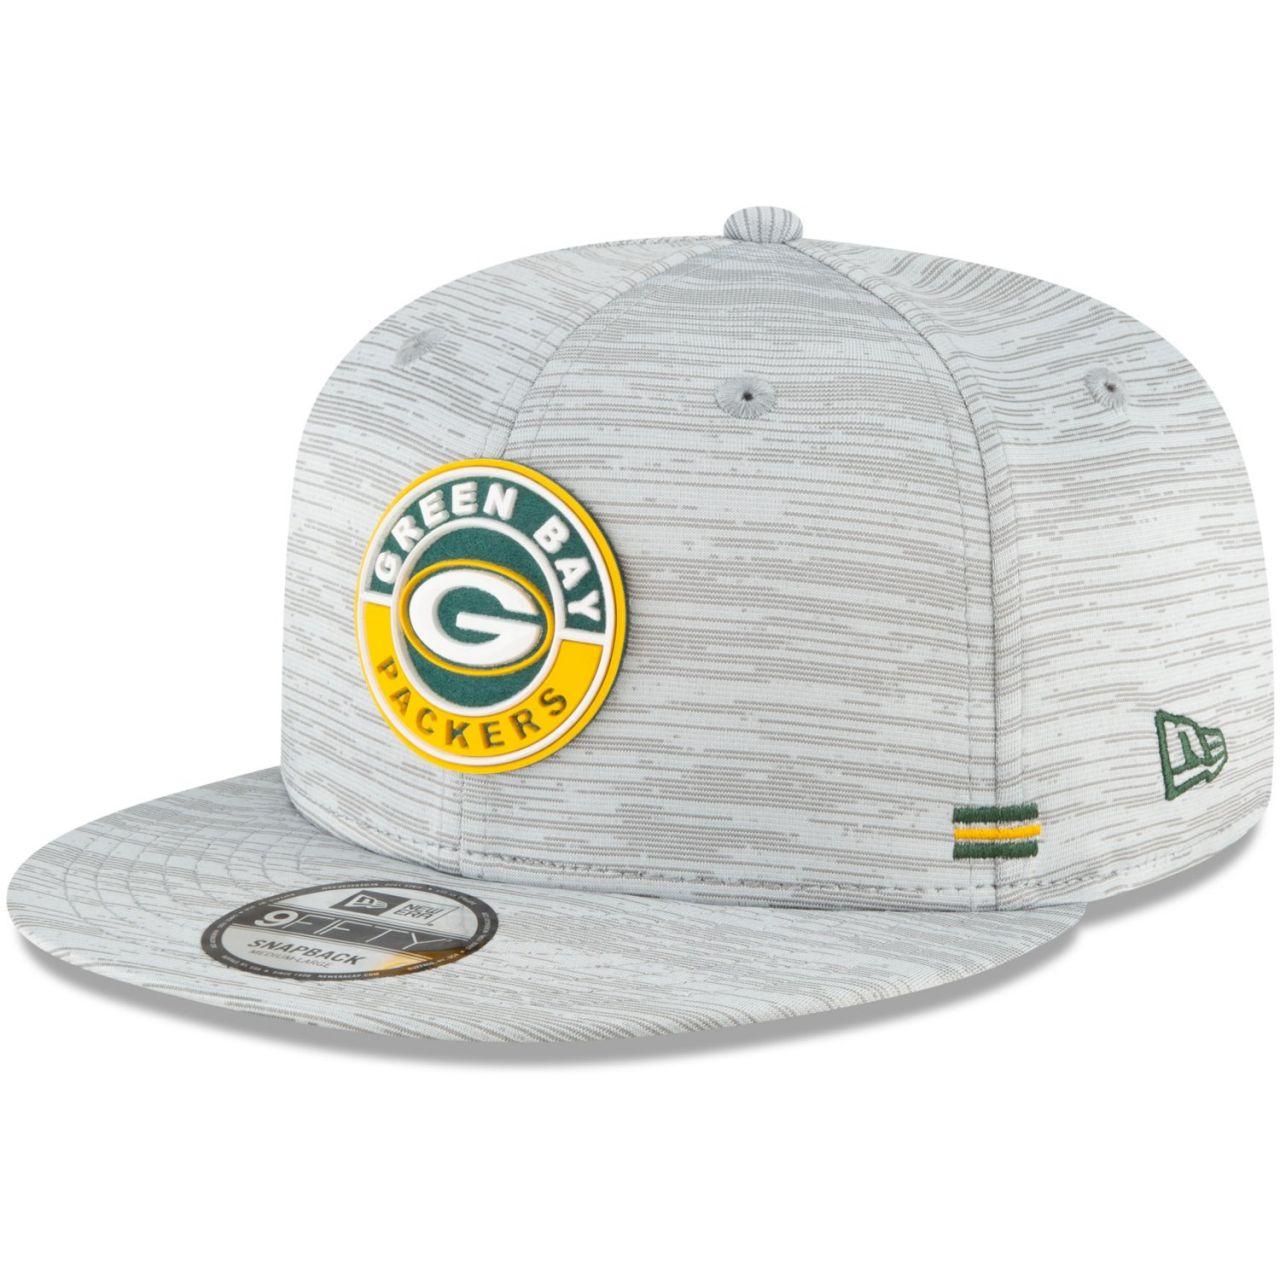 amfoo - New Era 9FIFTY Snapback Cap SIDELINE 2020 Green Bay Packers